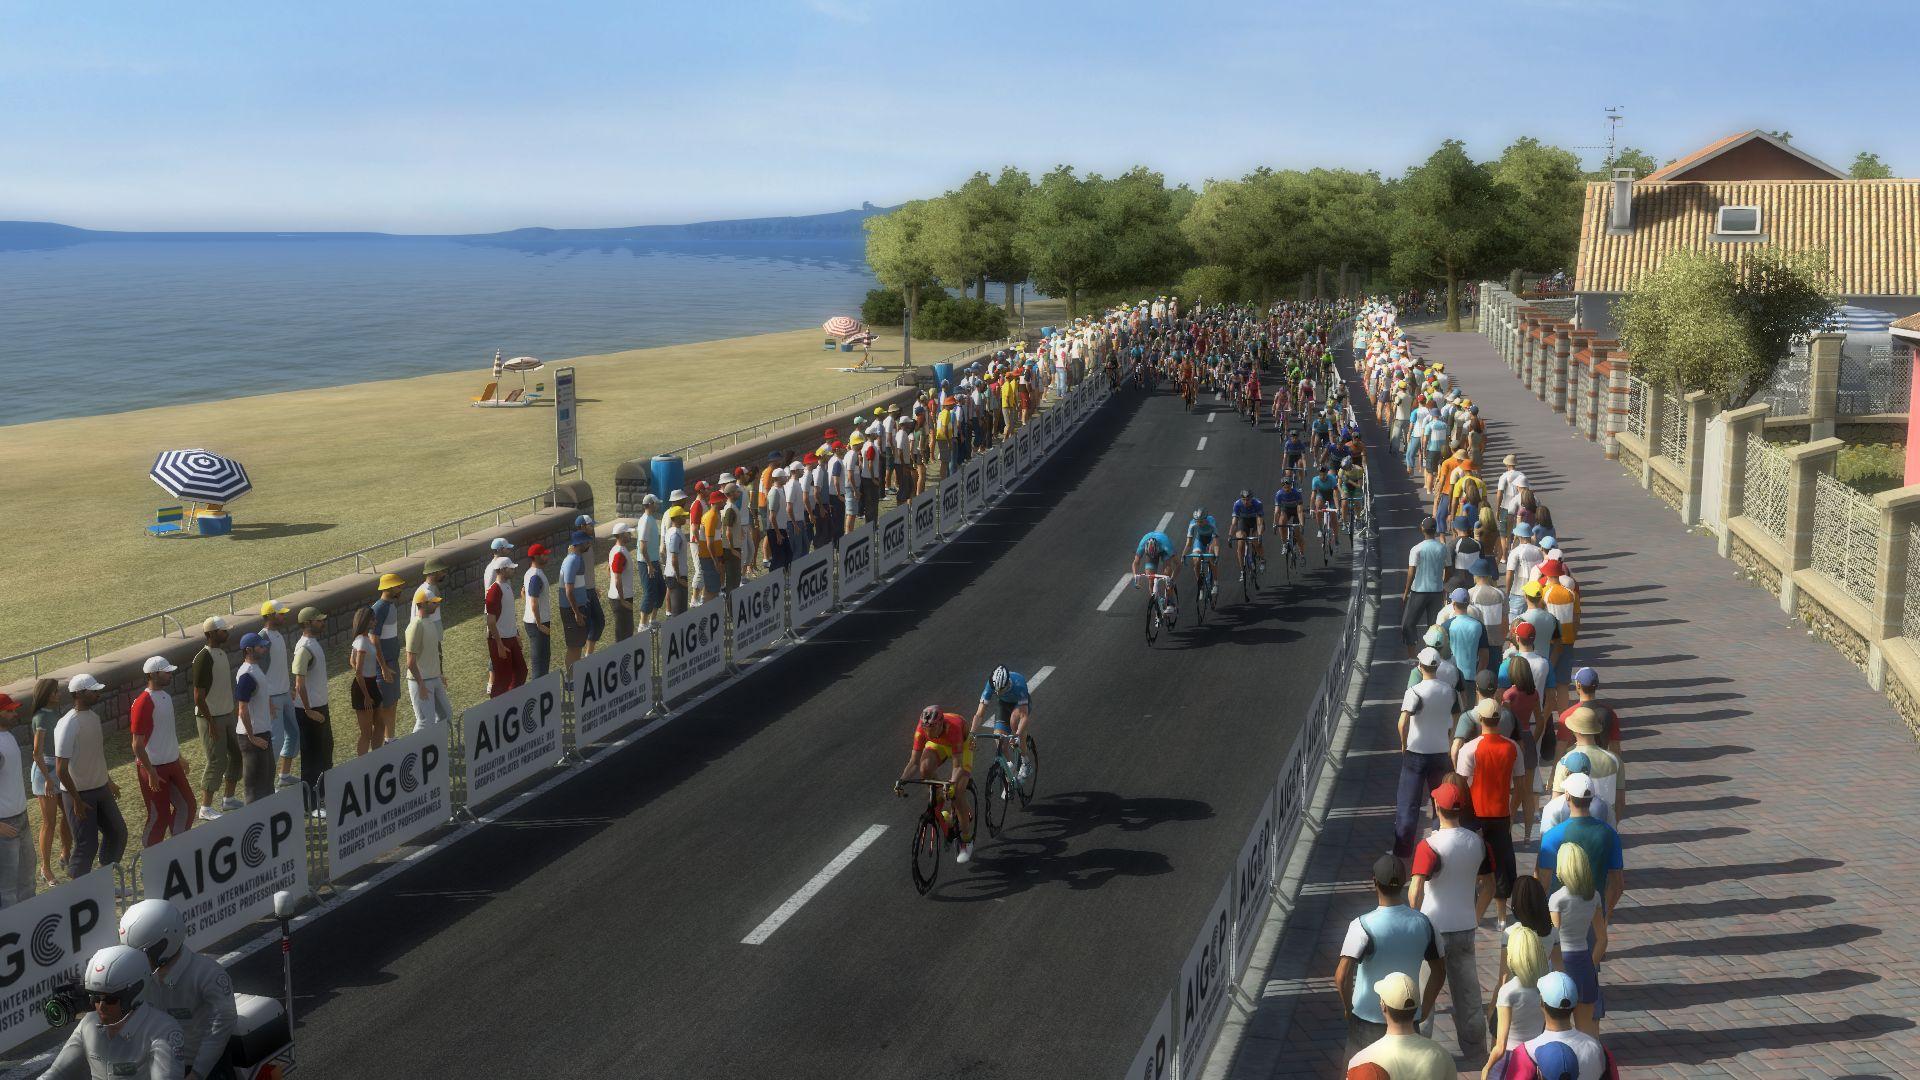 pcmdaily.com/images/mg/2019/Races/PT/Tirreno/mg19_ta_s07_15.jpg